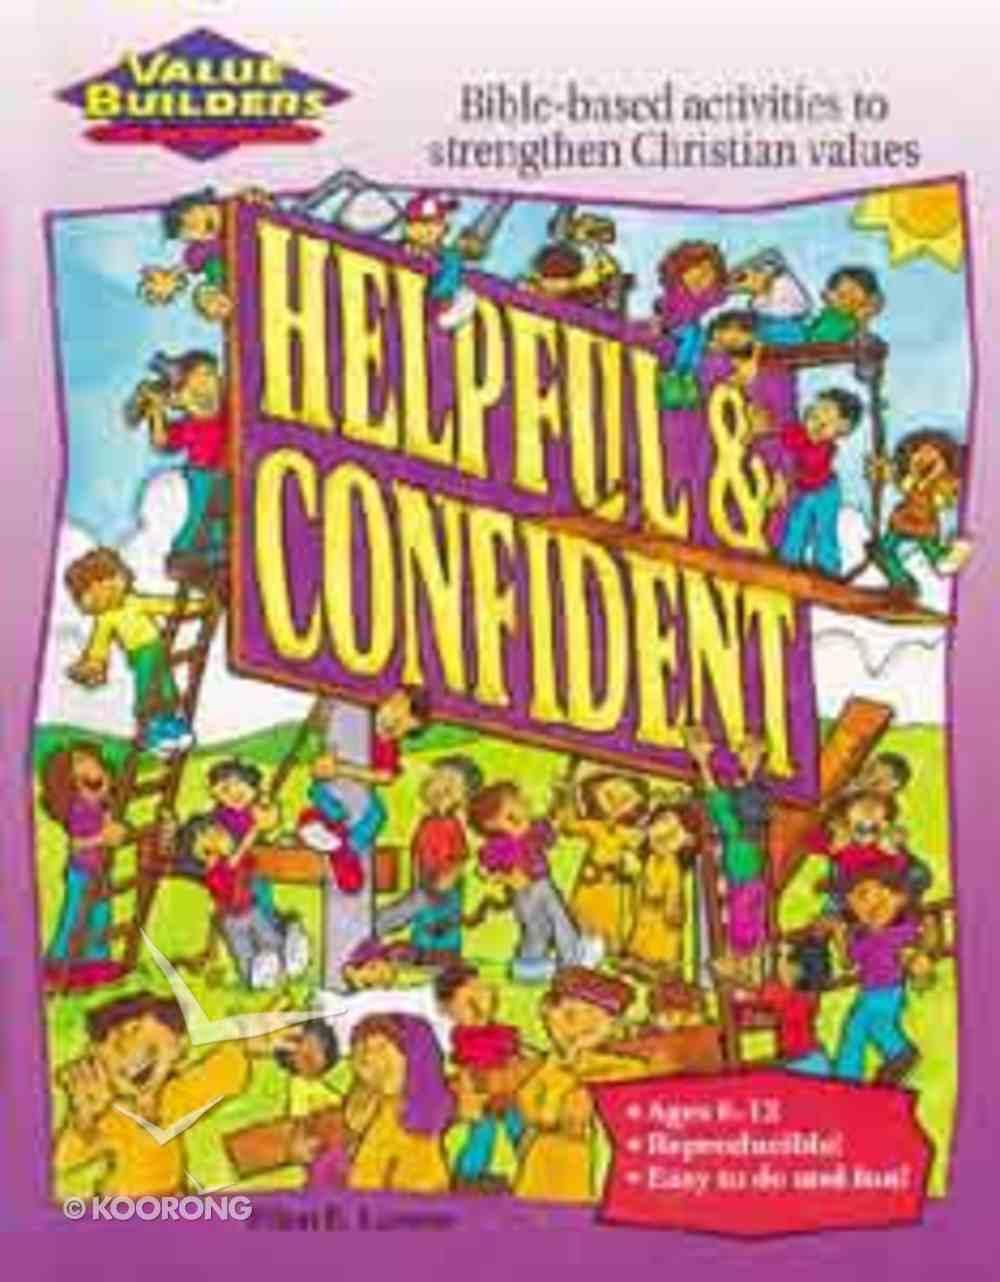 Value Builders: Helpful & Confident Paperback